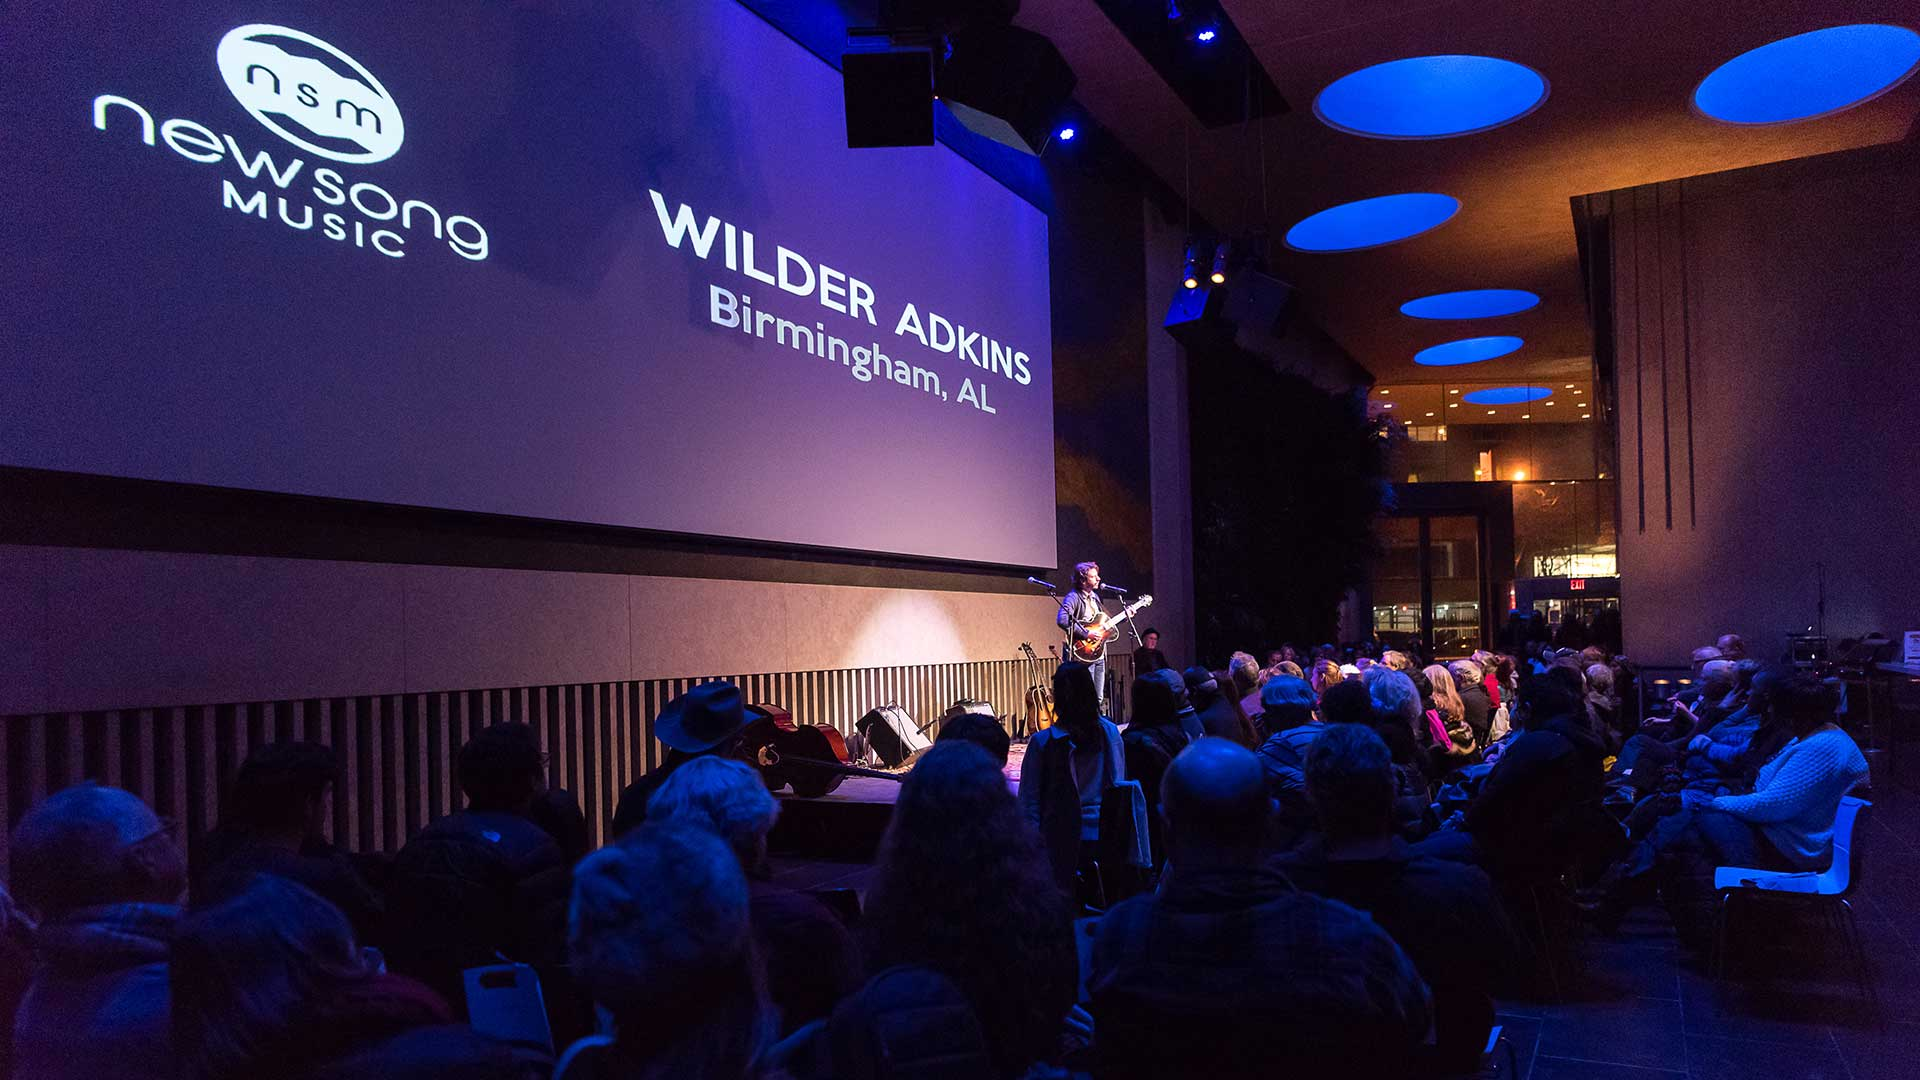 Wilder Adkins NEWSONG